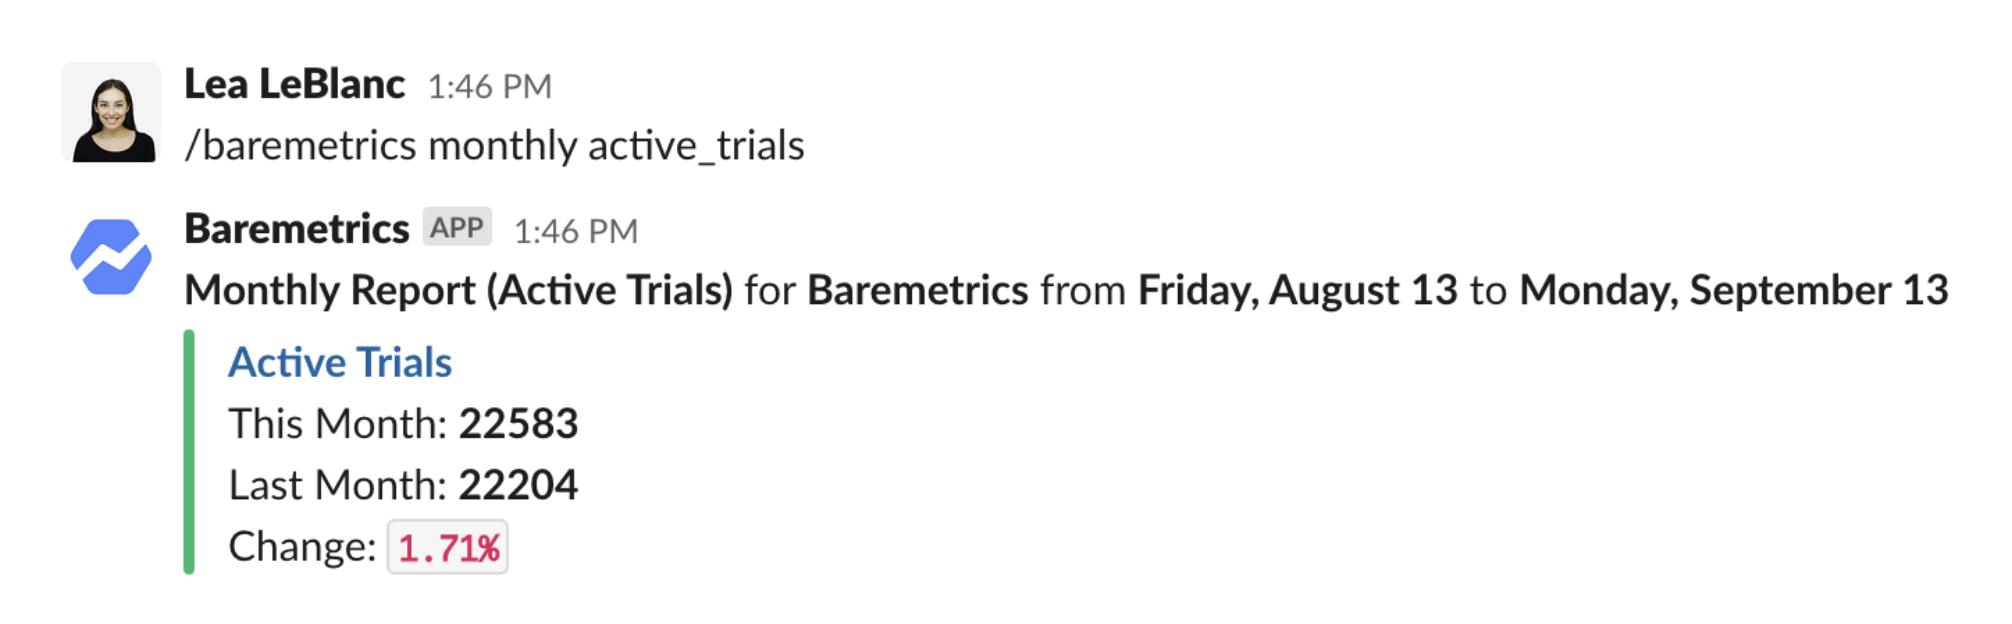 Baremetrics Slack notifications